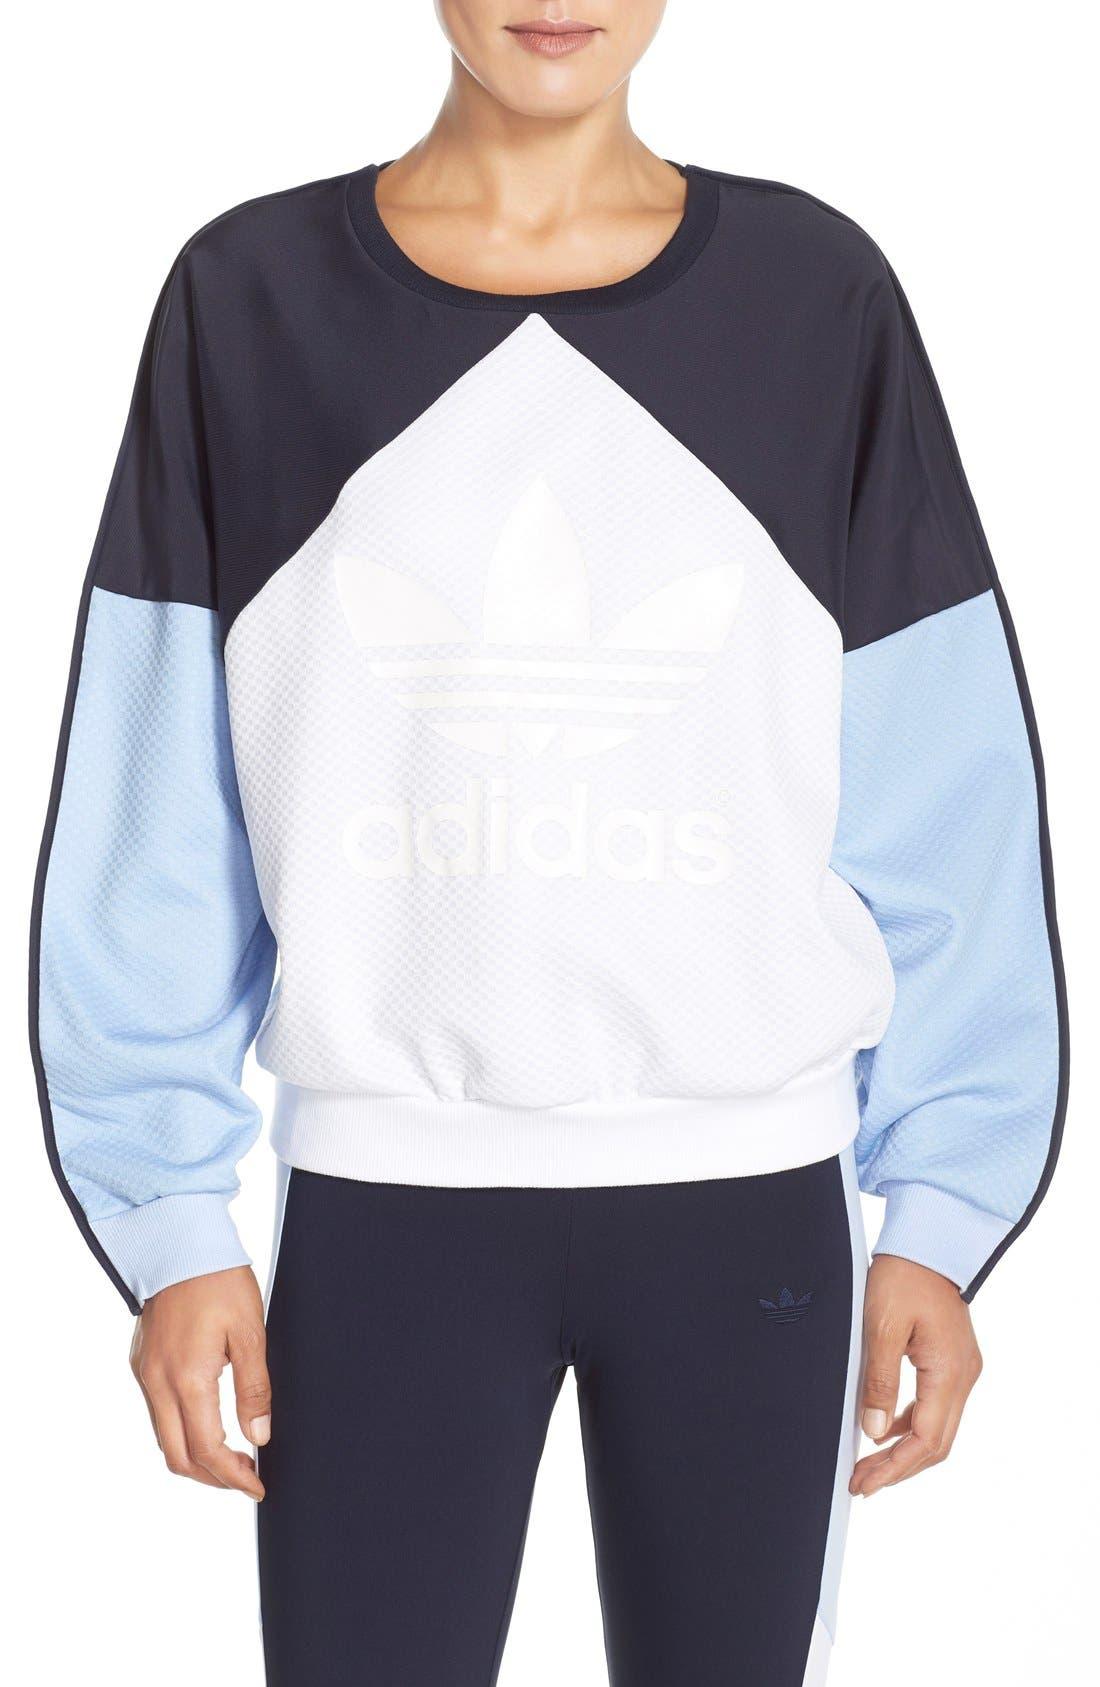 Main Image - adidas Originals 'Helsinki' Crewneck Sweatshirt